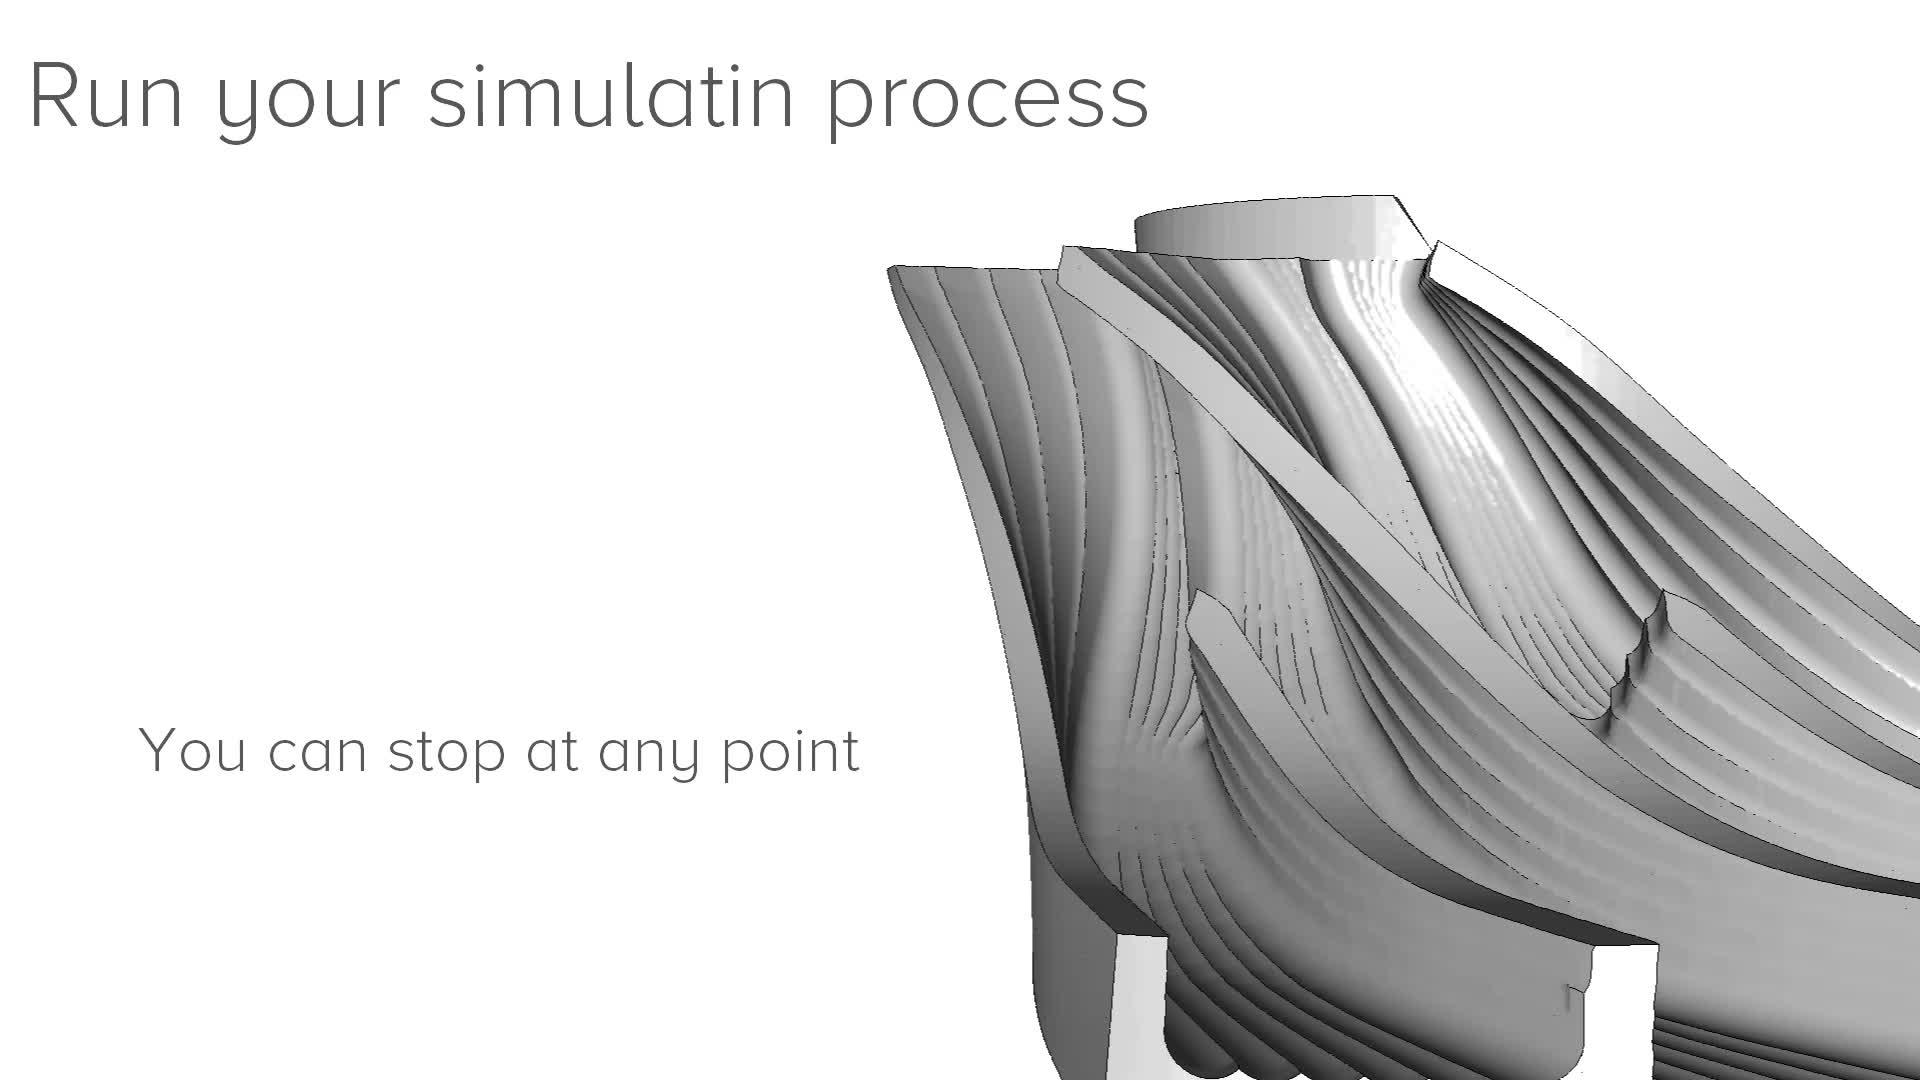 4D Simulation